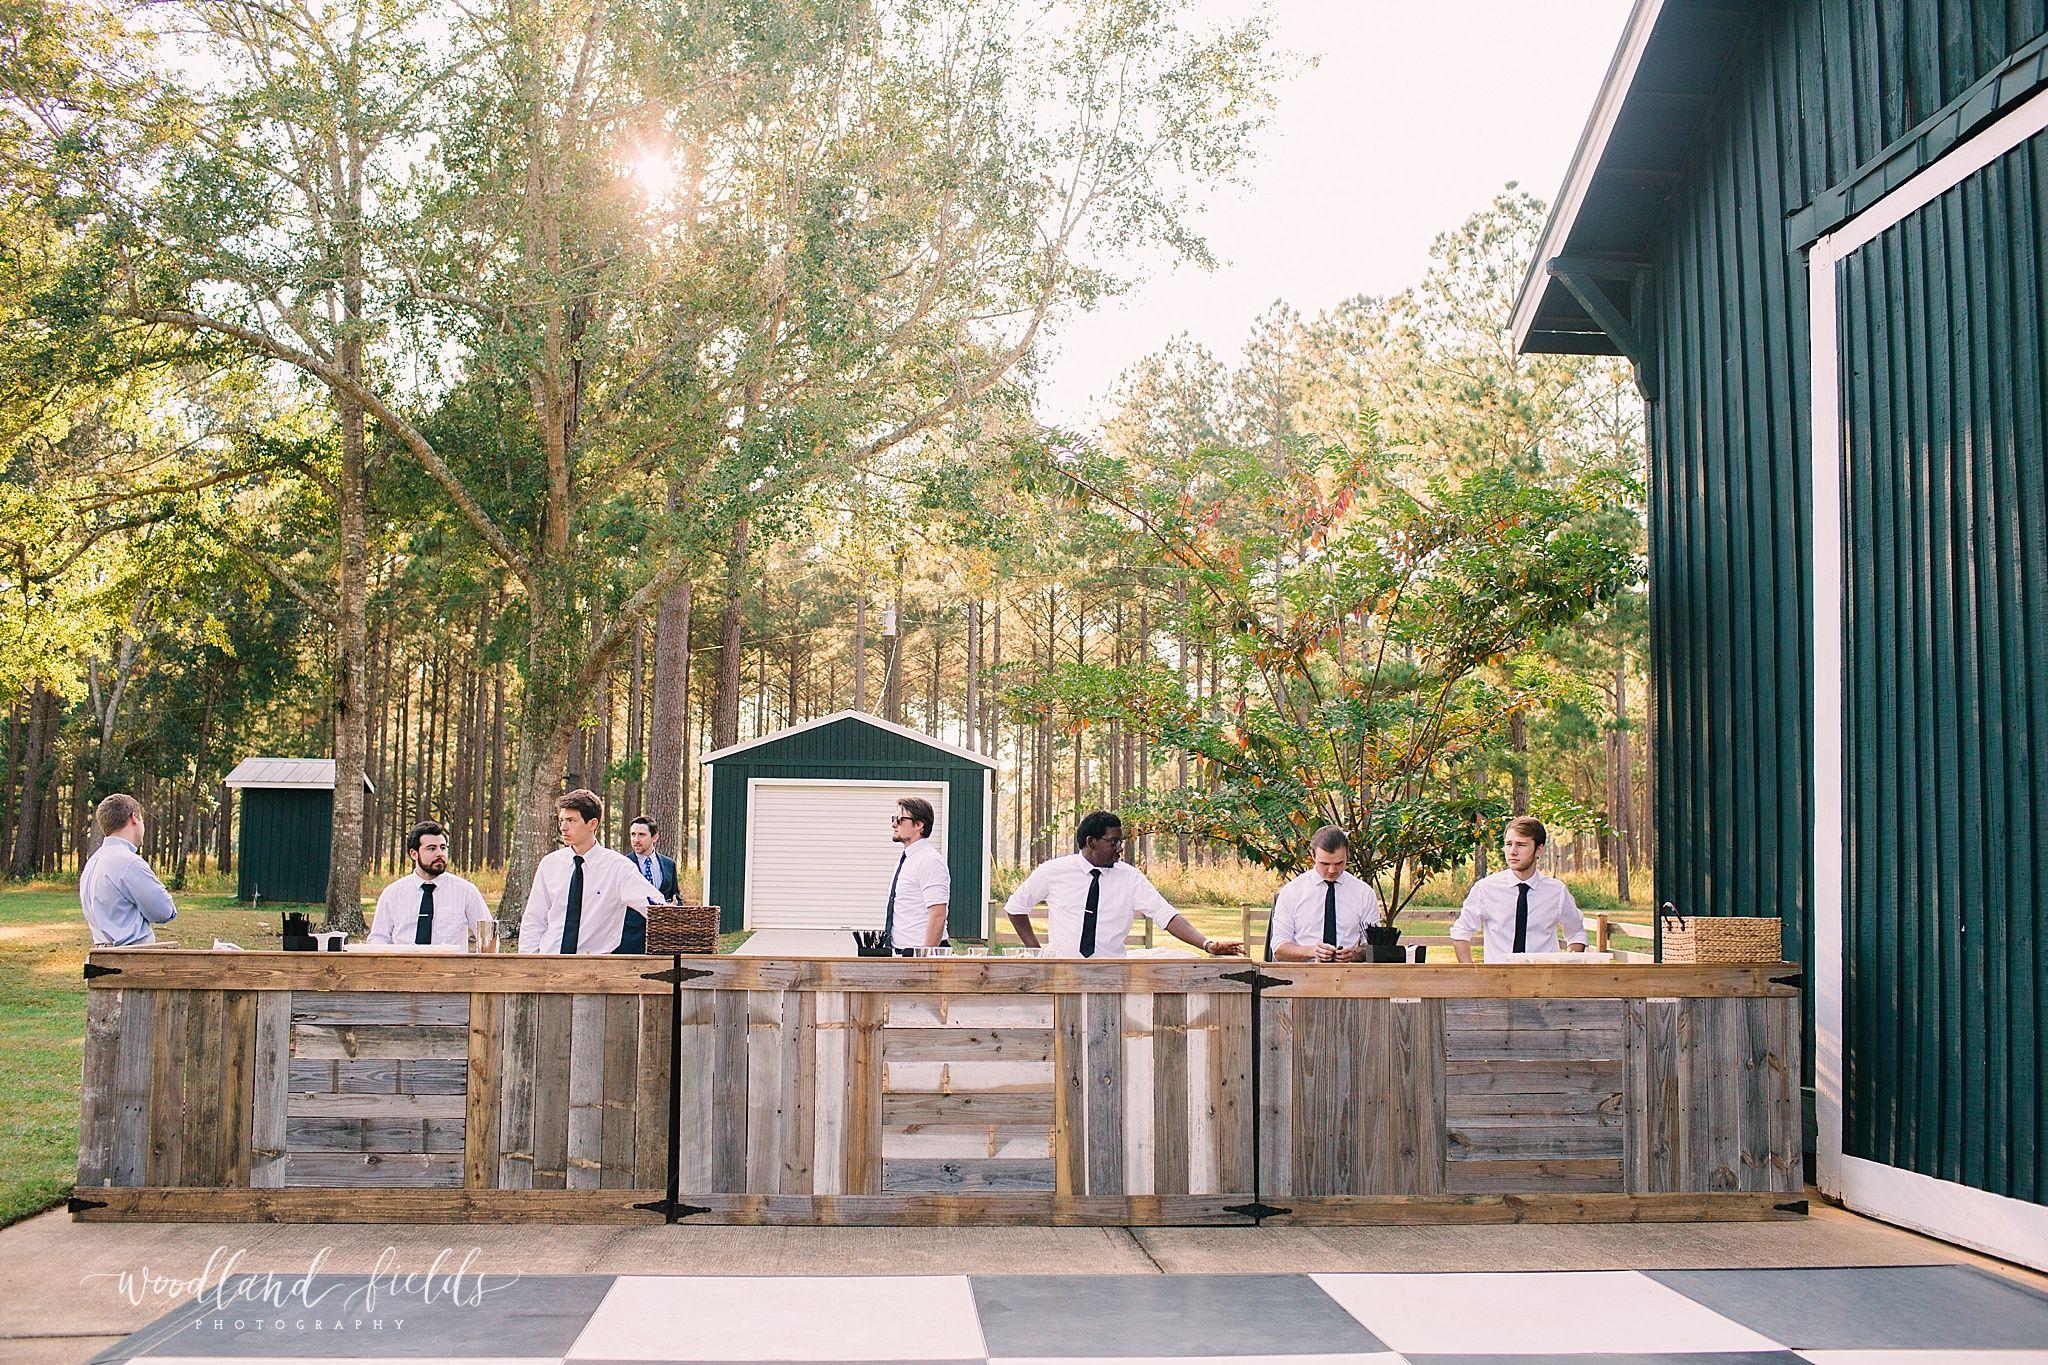 Mandy and steven outdoor wedding bar fields photography